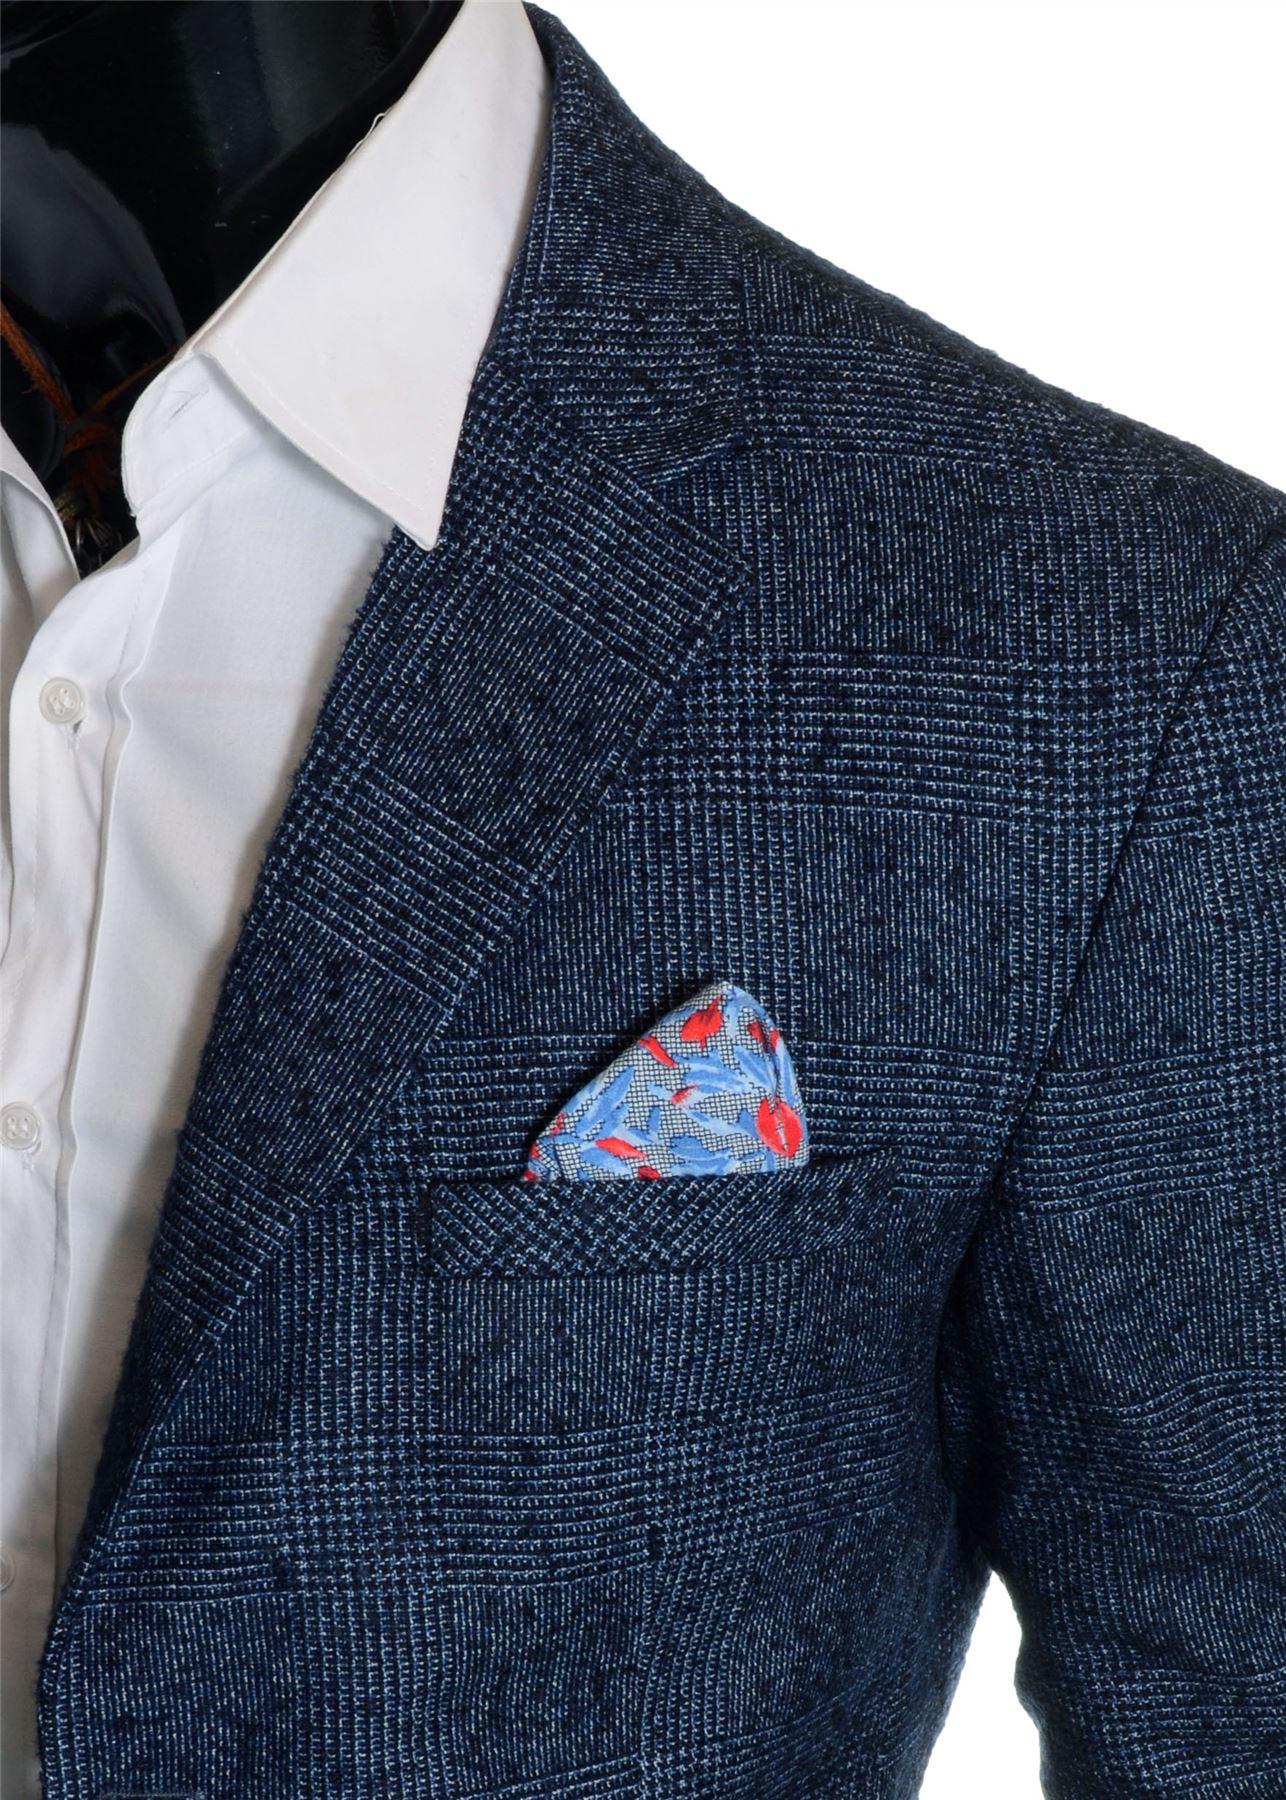 Men-039-s-Checkered-Coat-3-4-Long-Tweed-Cashmere-Wool-Trendy-Formal-Winter-Overcoat thumbnail 10